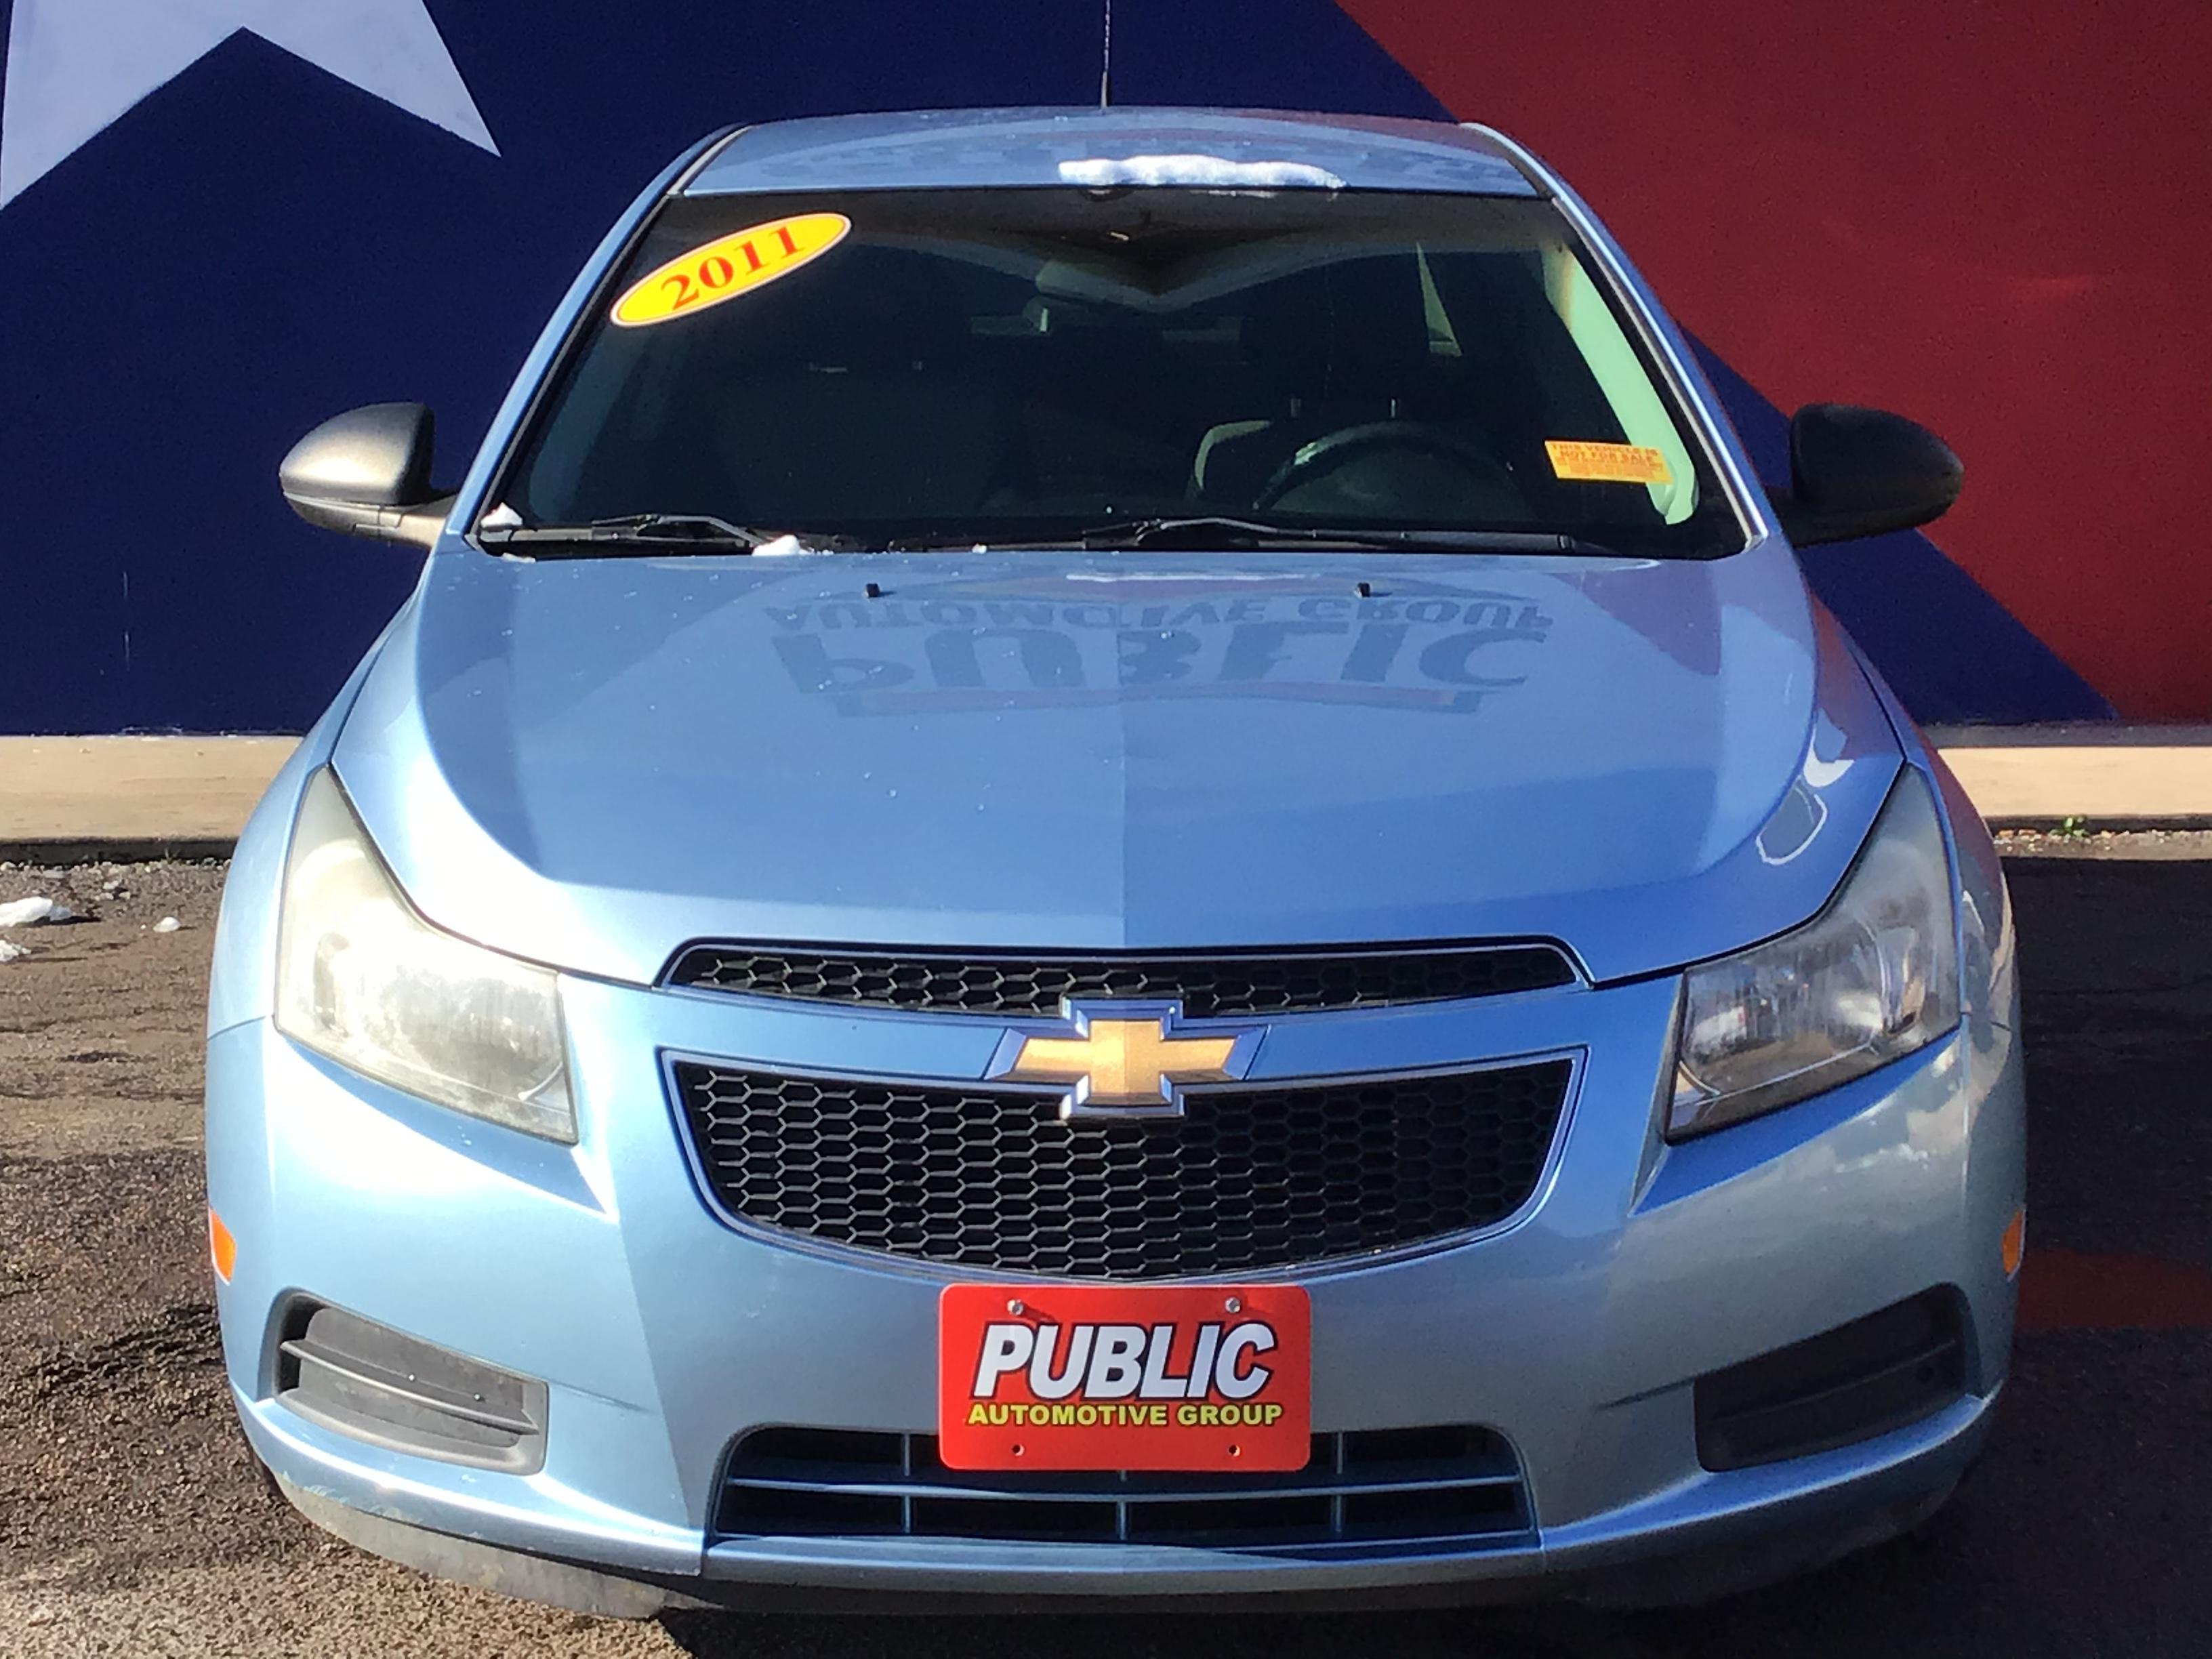 used vehicle - Sedan CHEVROLET CRUZE 2011